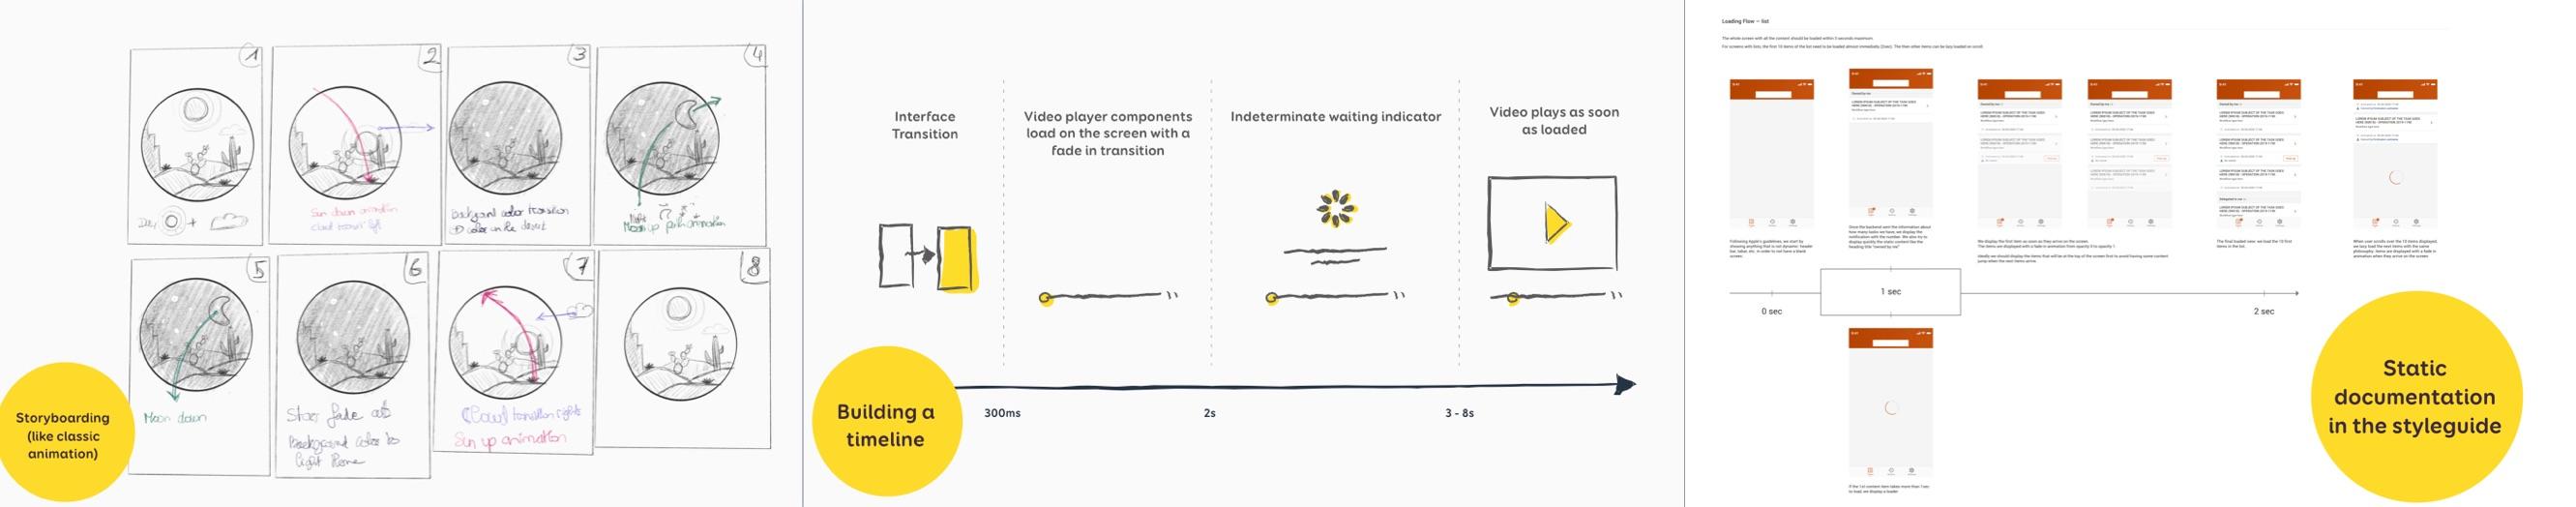 Illustration of the 3 types of static documentation